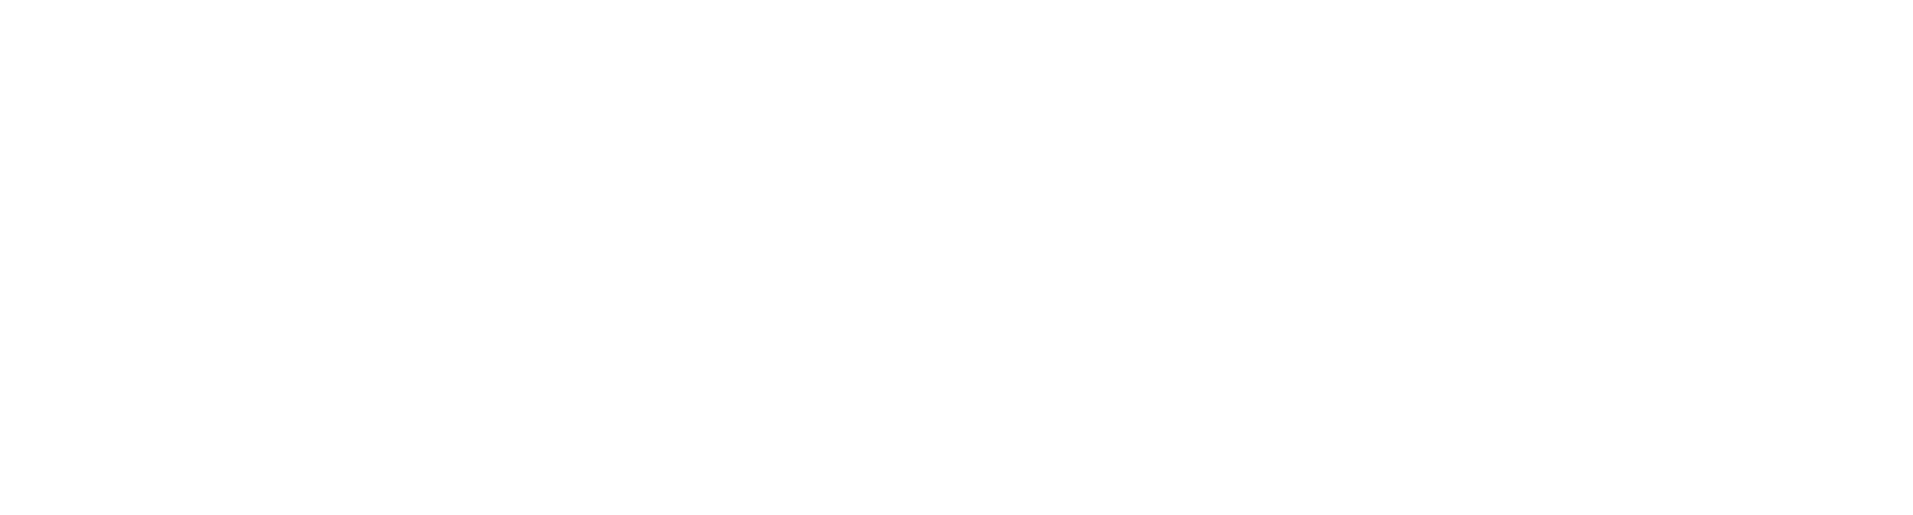 raum.nrw